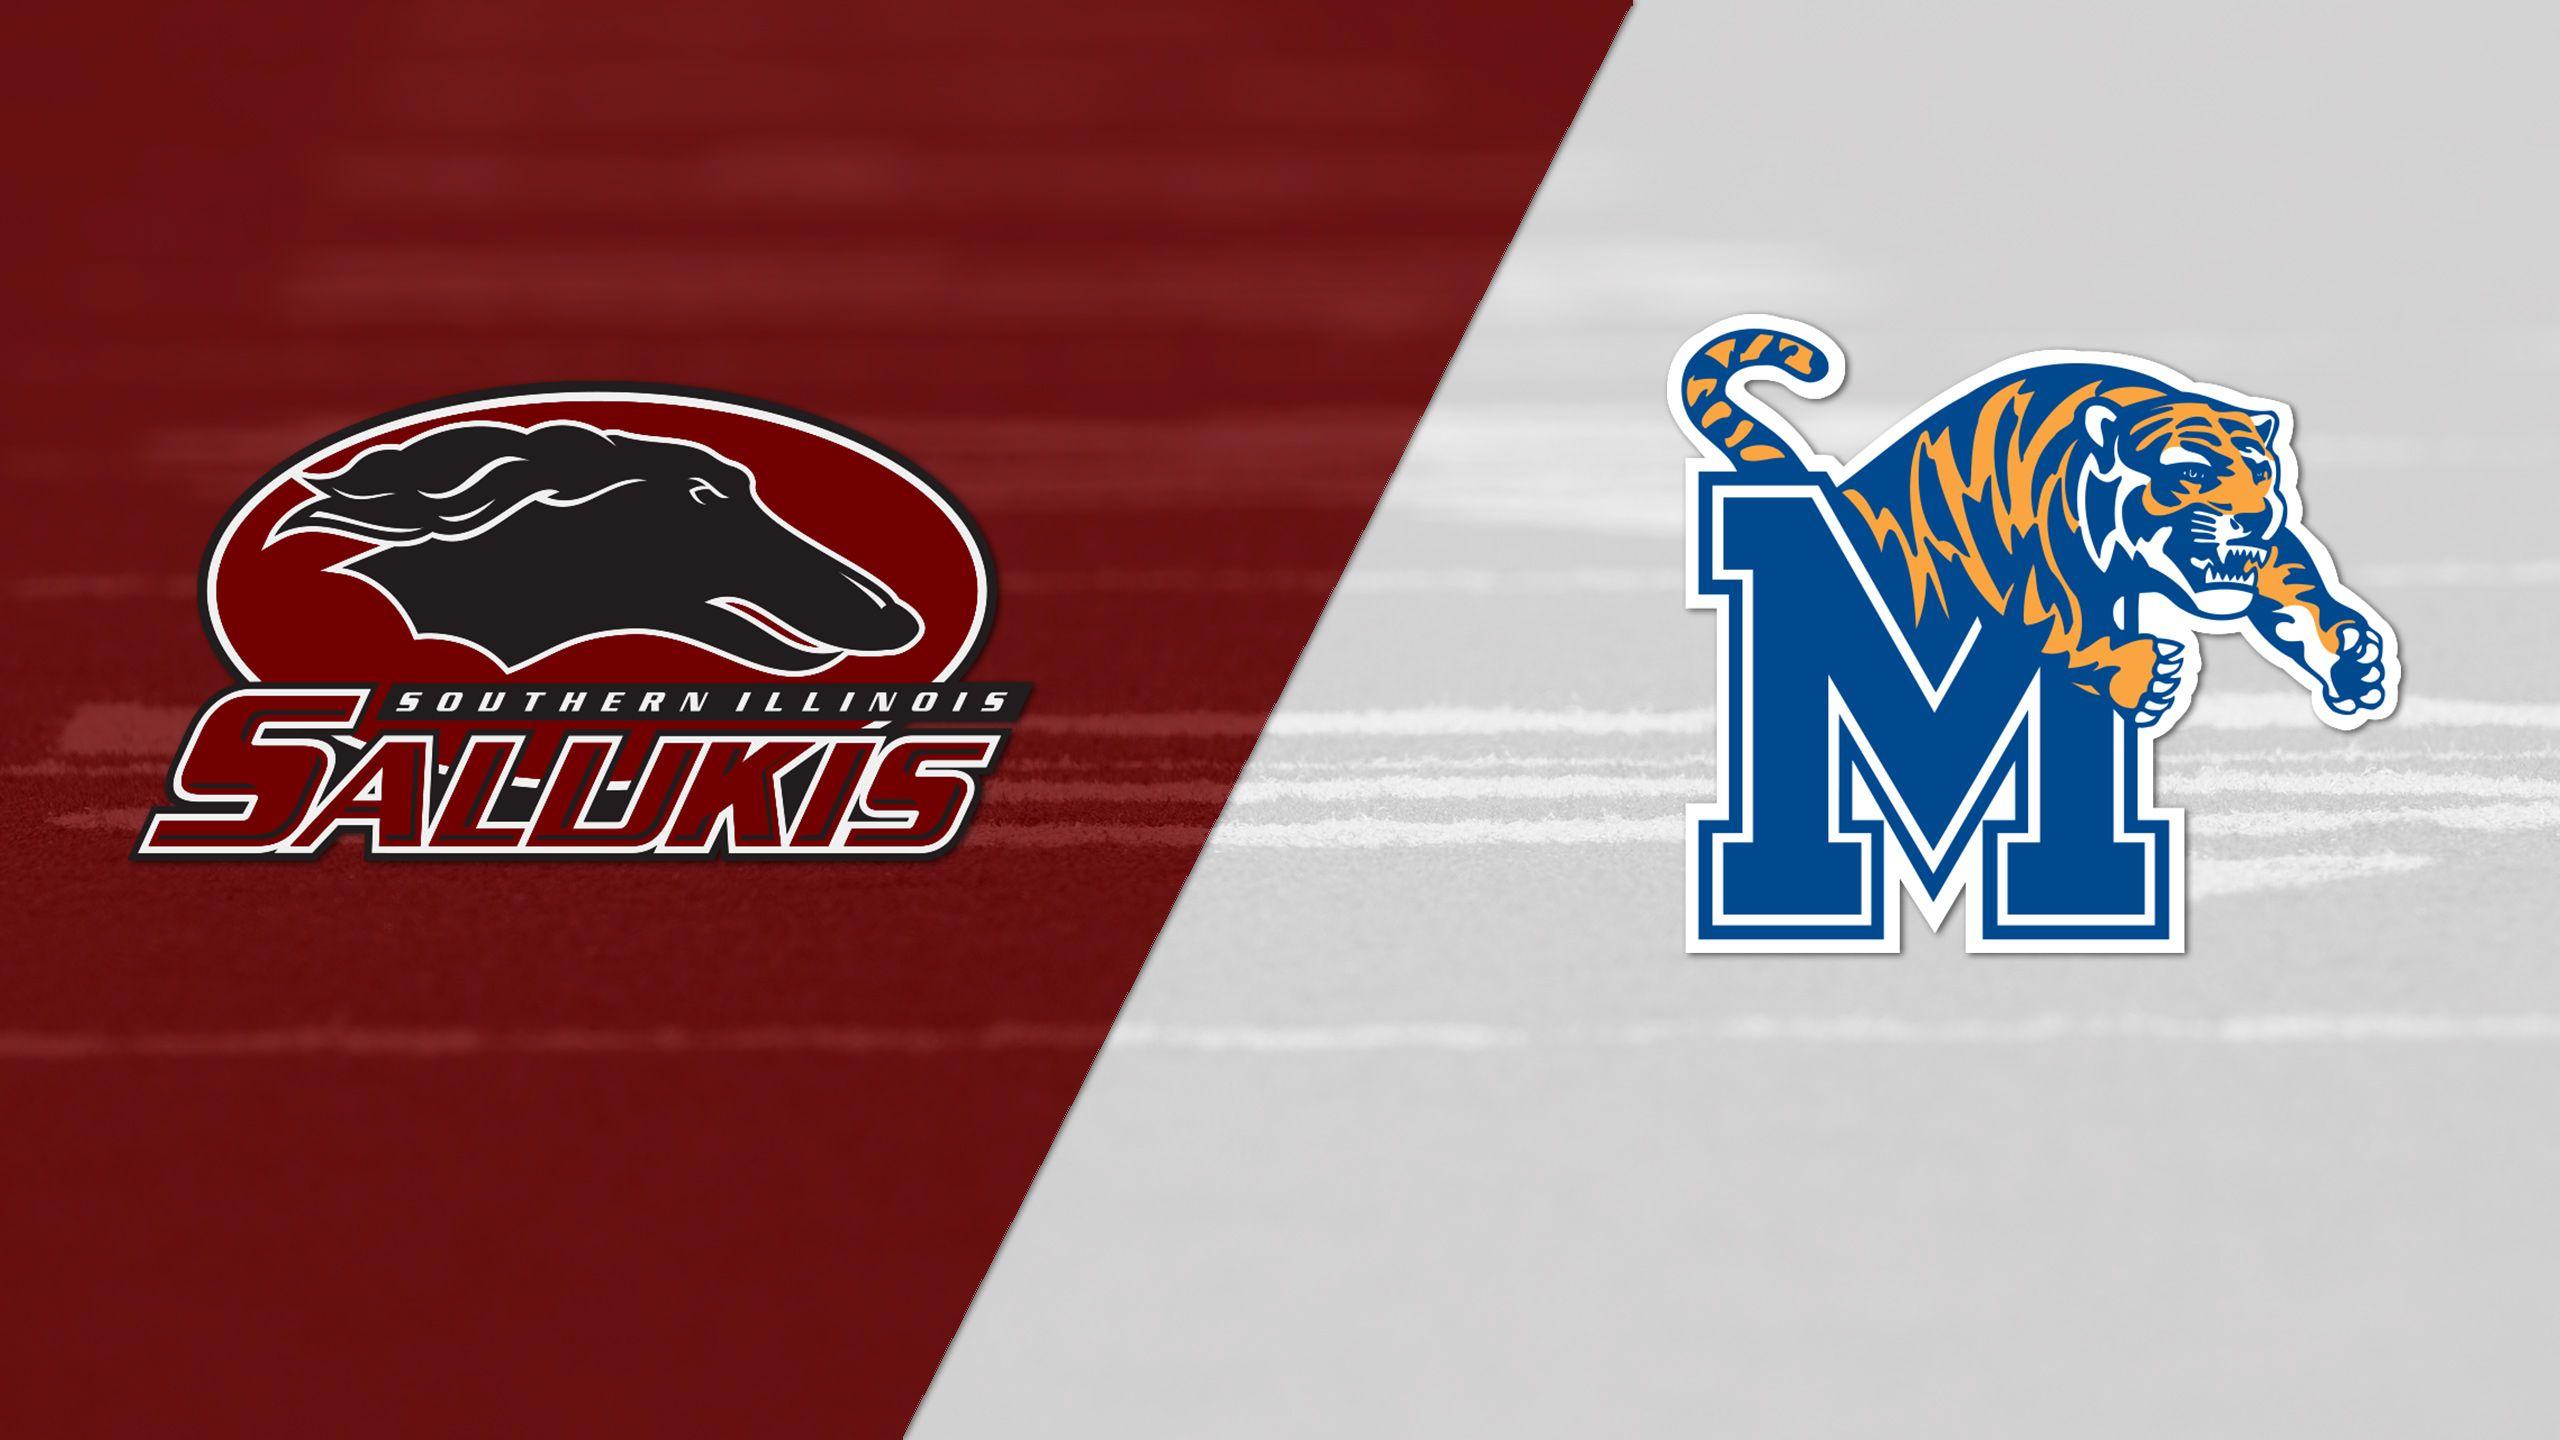 Southern Illinois vs. Memphis (Football)